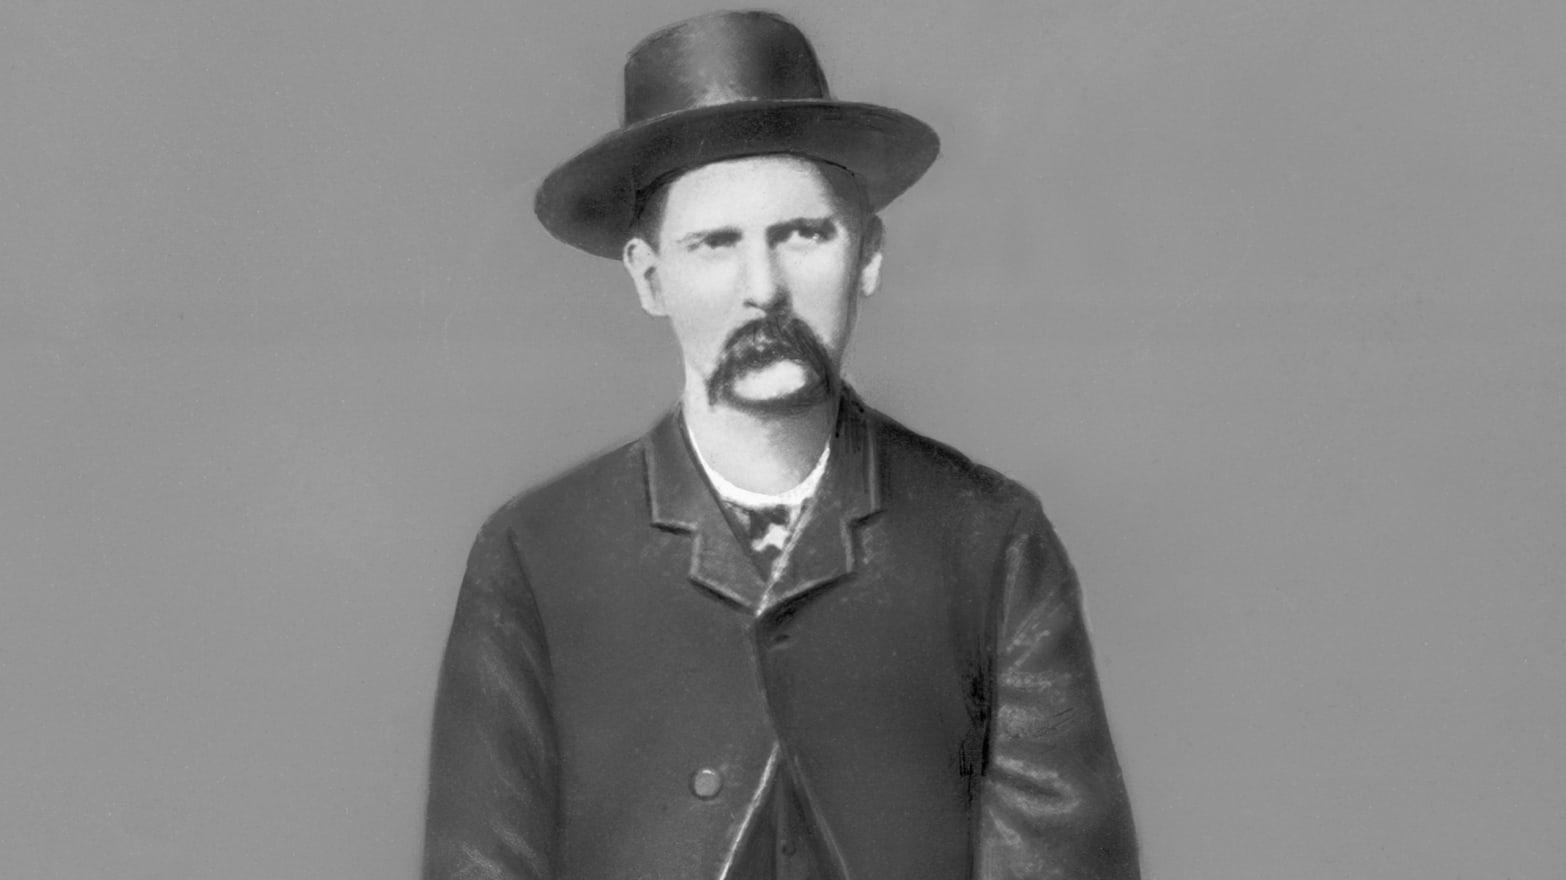 585a683855b The Wyatt Earp Myth  America s Most Famous Vigilante Wasn t